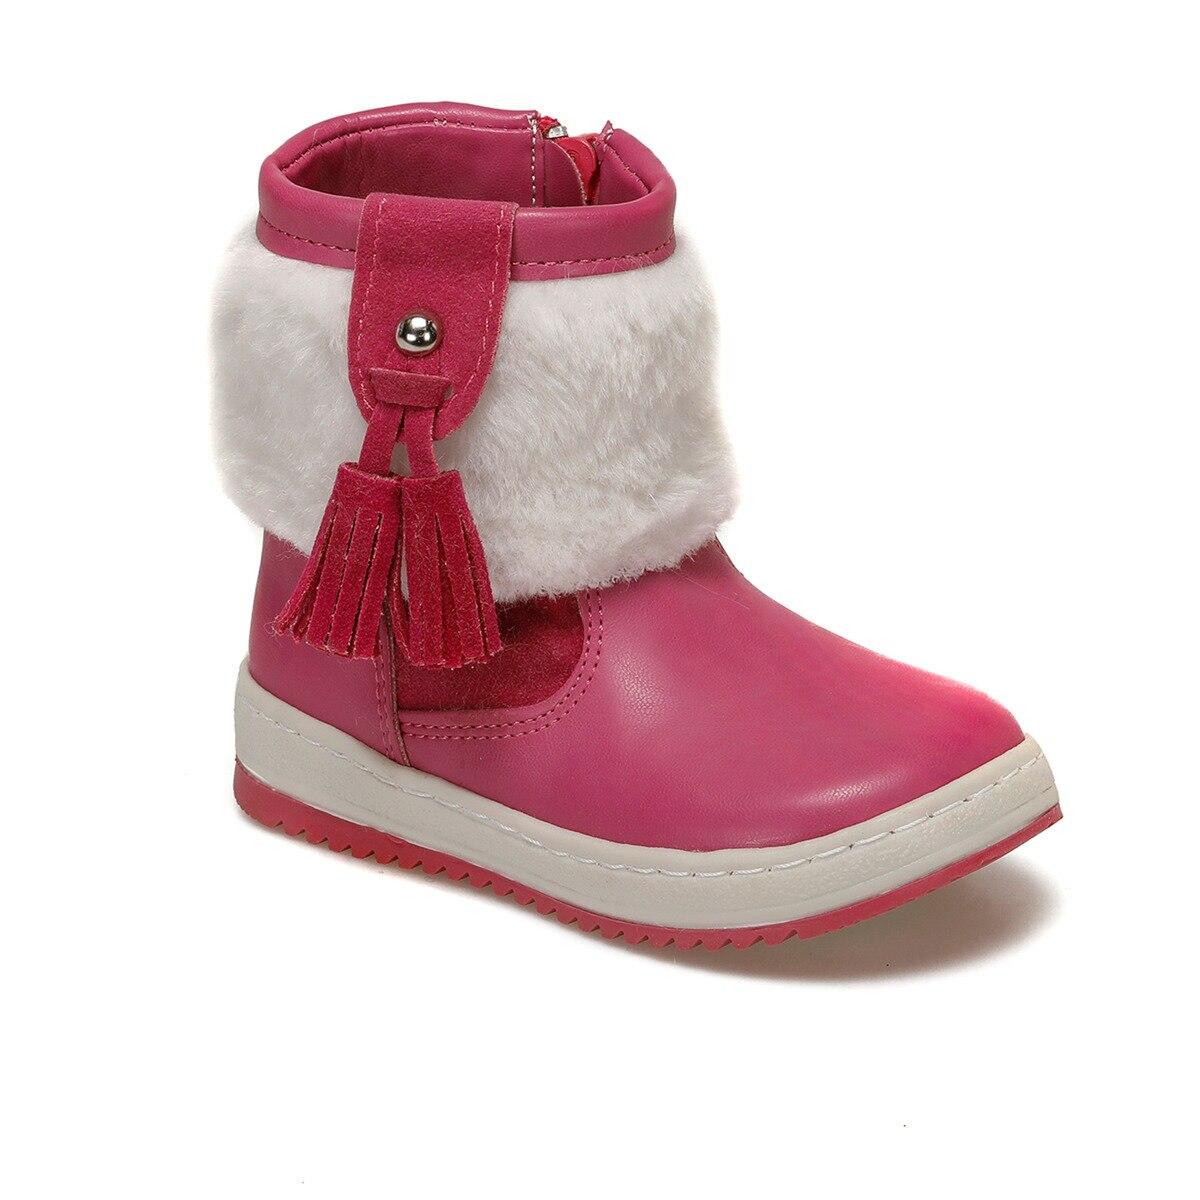 FLO 72. 509537.B Fuchsia Female Child Classic Boots Polaris